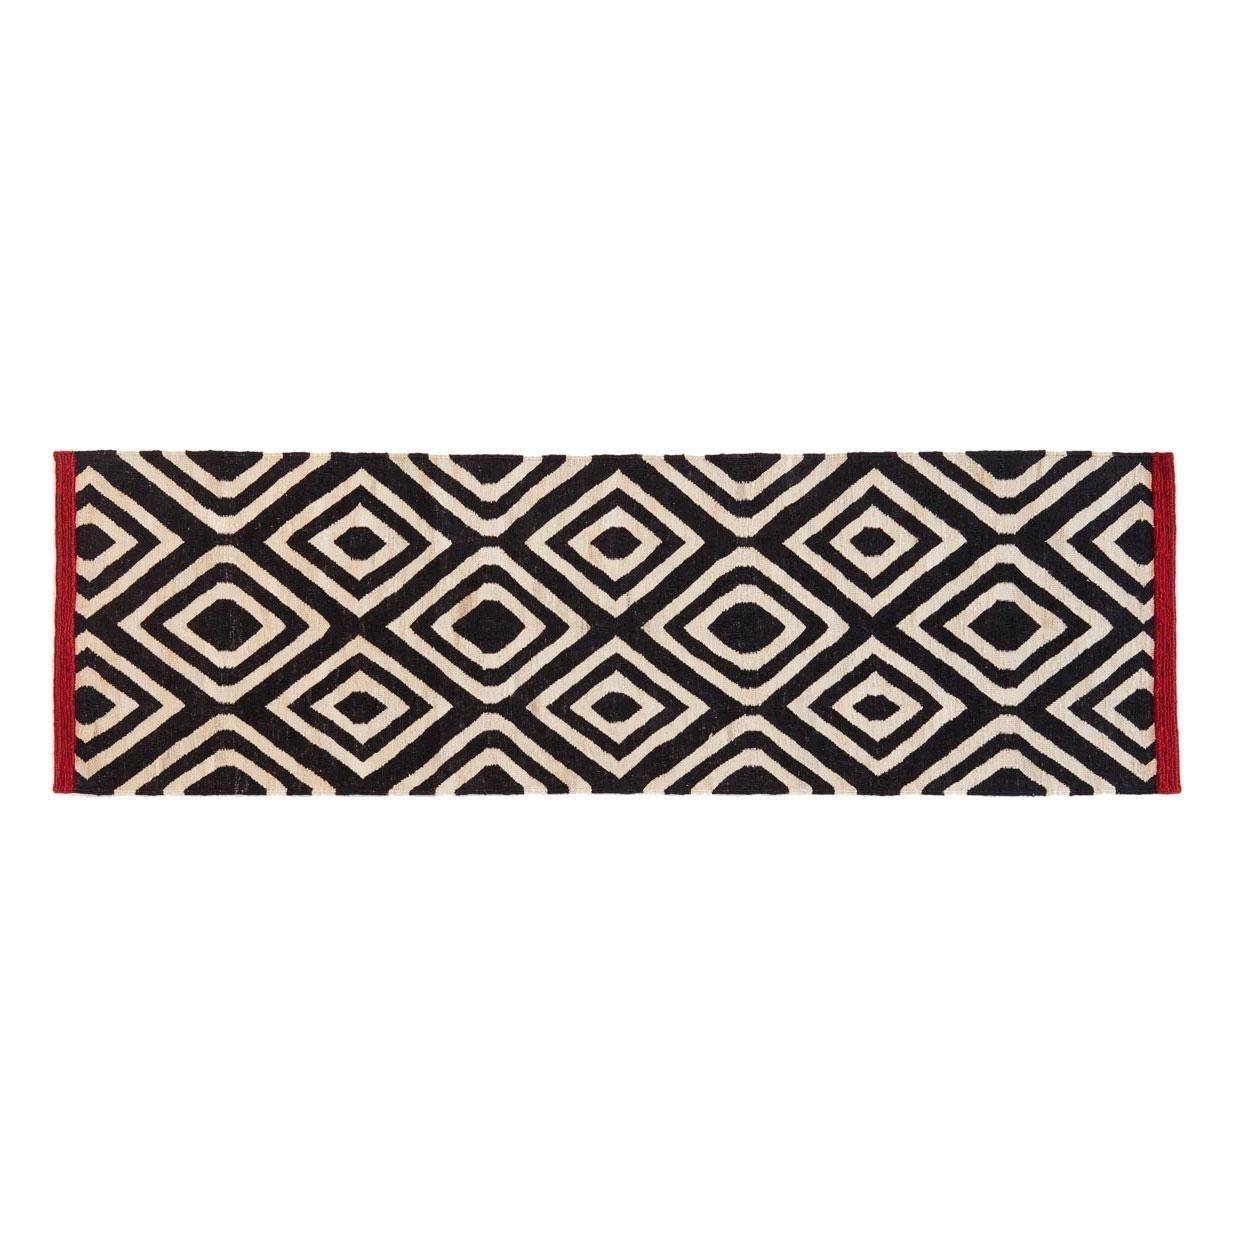 melange pattern 1 kilim tapis de couloir